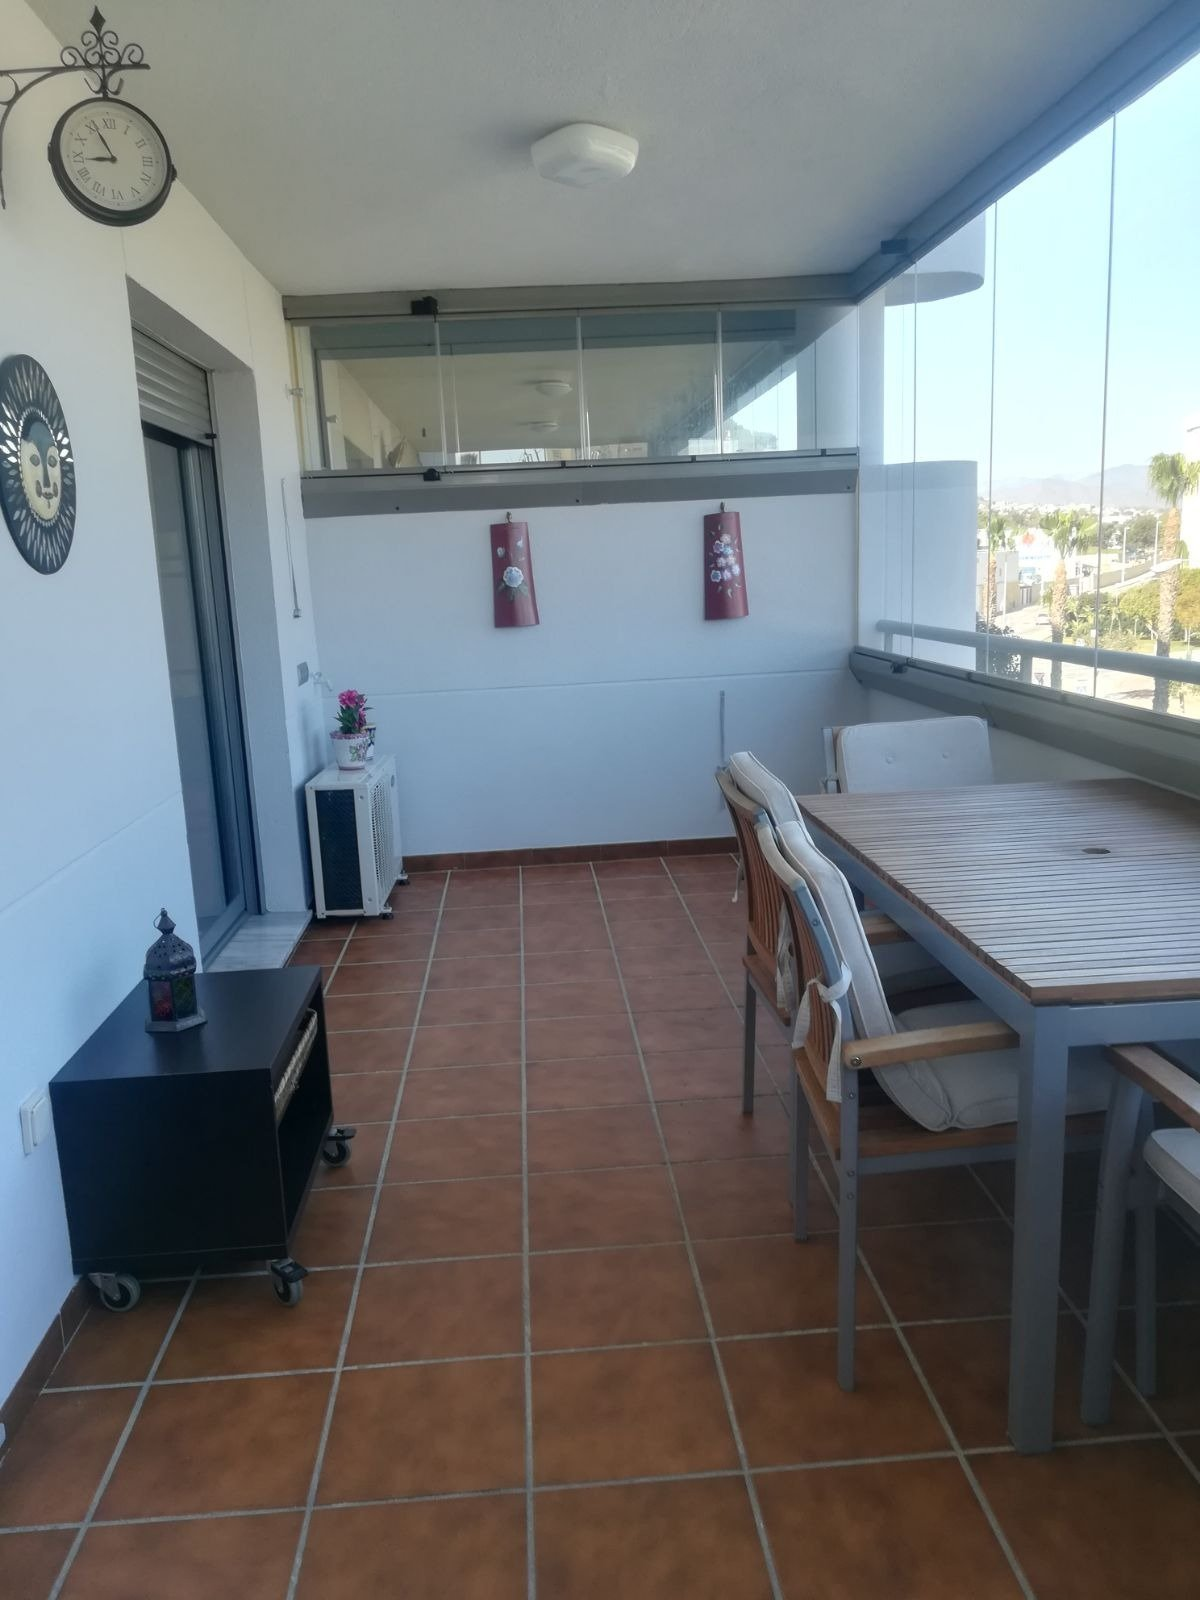 Flat for sale in CASTILLO-MIRAMAR, Fuengirola